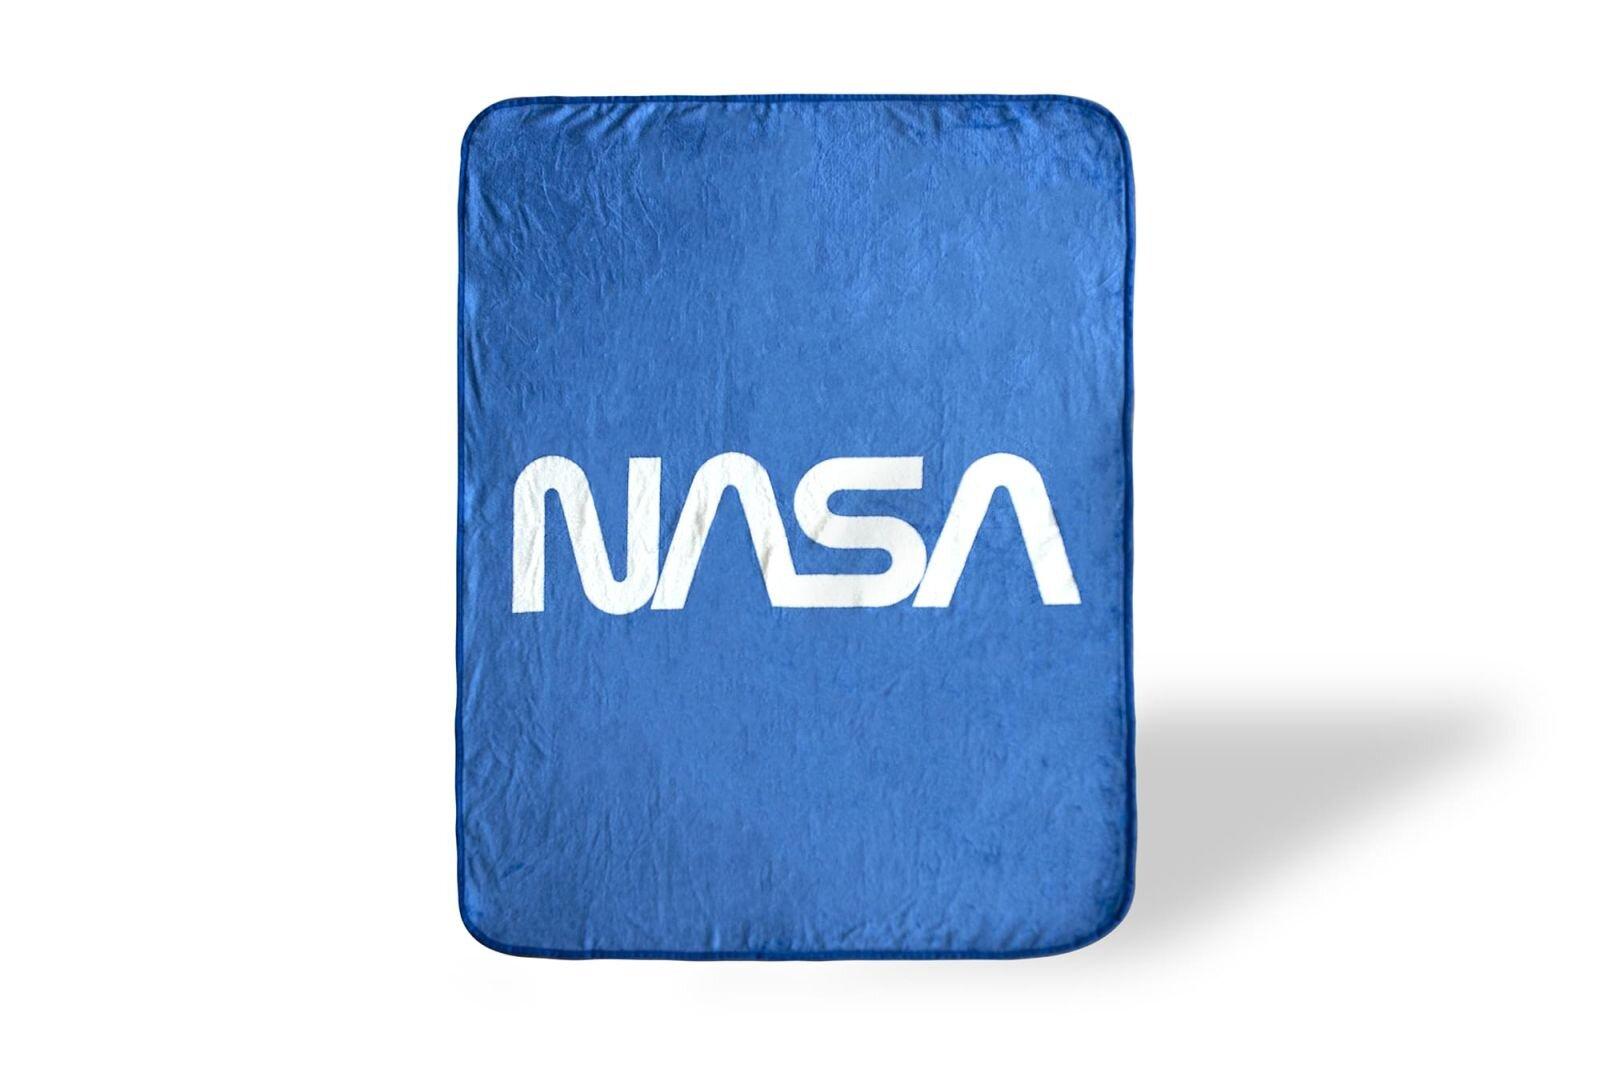 JFL-NASA-BL-17882-CA.jpg